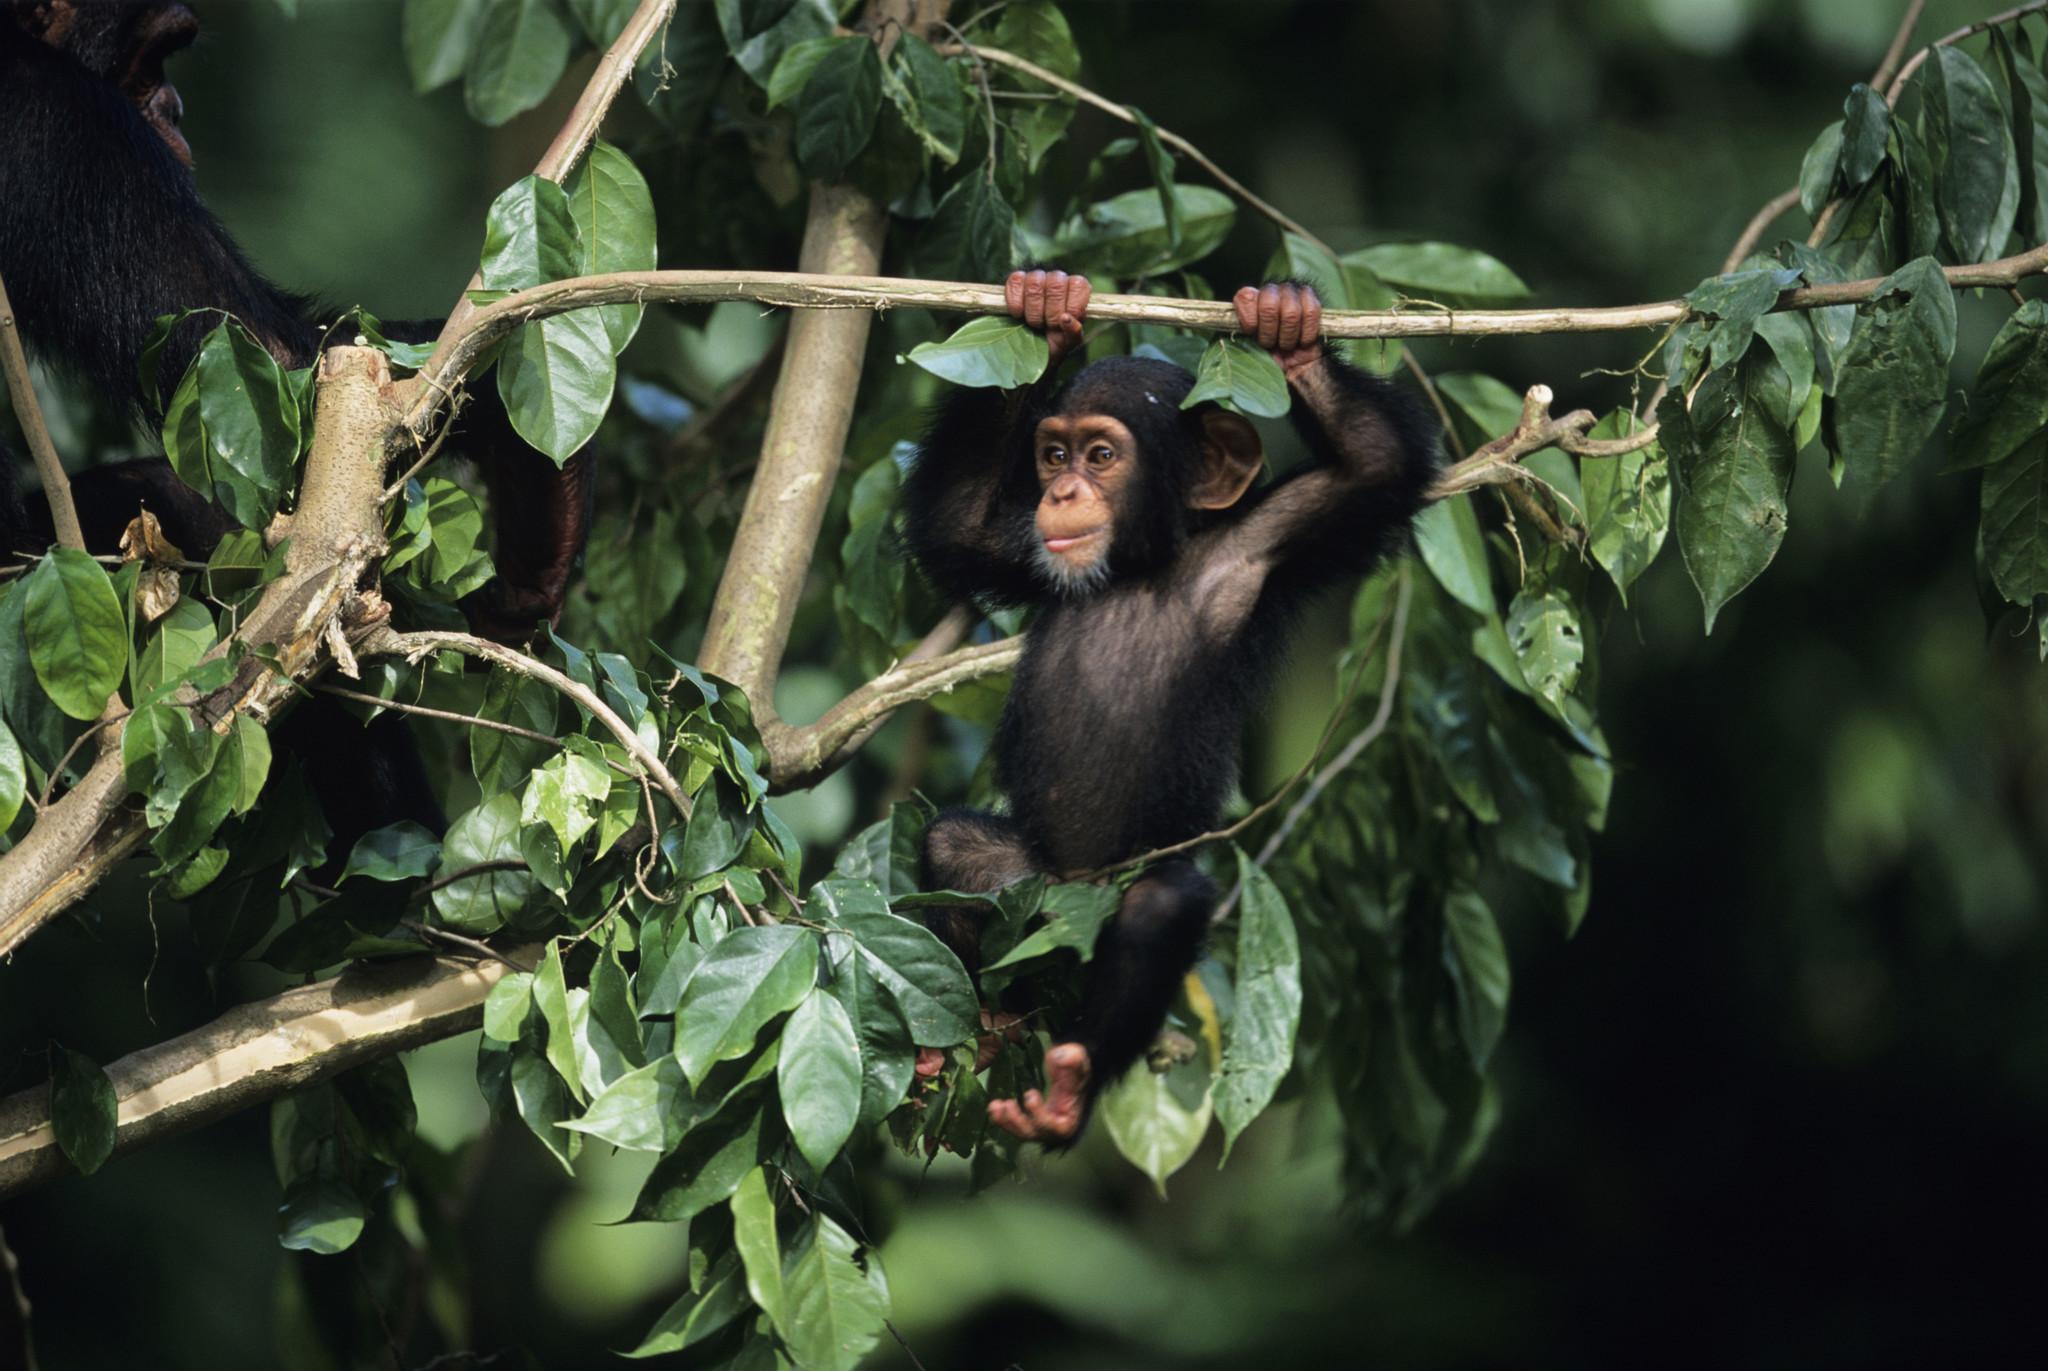 Young chimpanzee (Pan troglodytes) hanging on tree branch, close-up